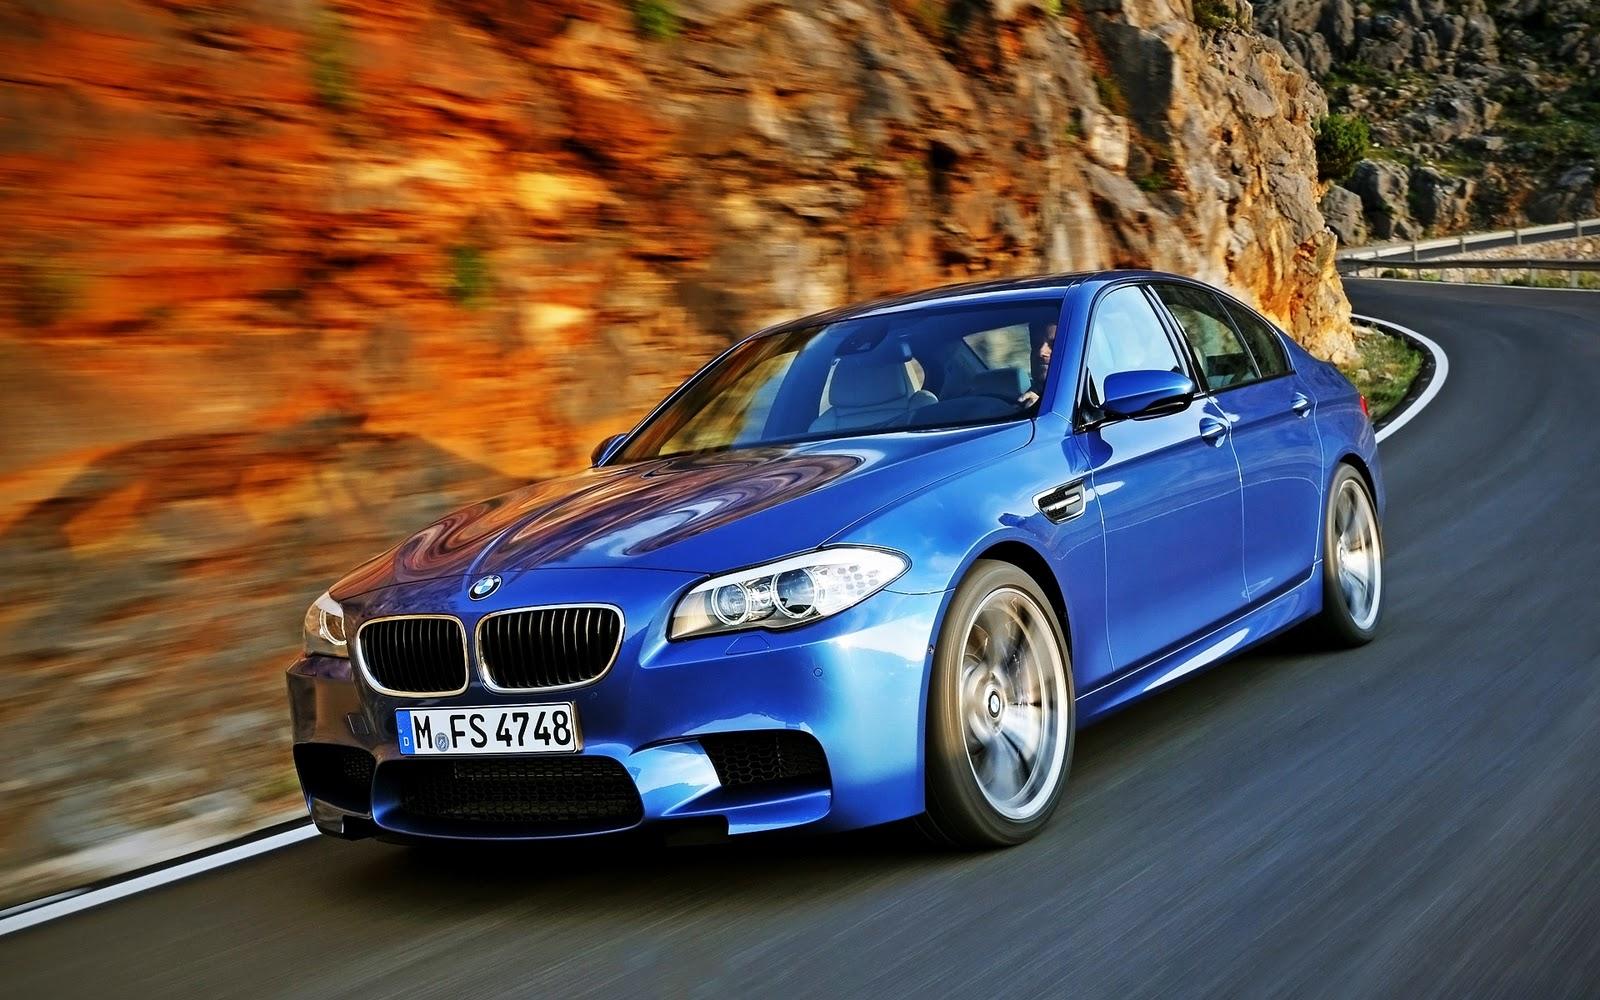 http://1.bp.blogspot.com/-iwiISmyCP0I/TuJTbPGw7oI/AAAAAAAABrg/drBAU6-S_O8/s1600/2012-BMW-M5_1920x1200_4118.jpg